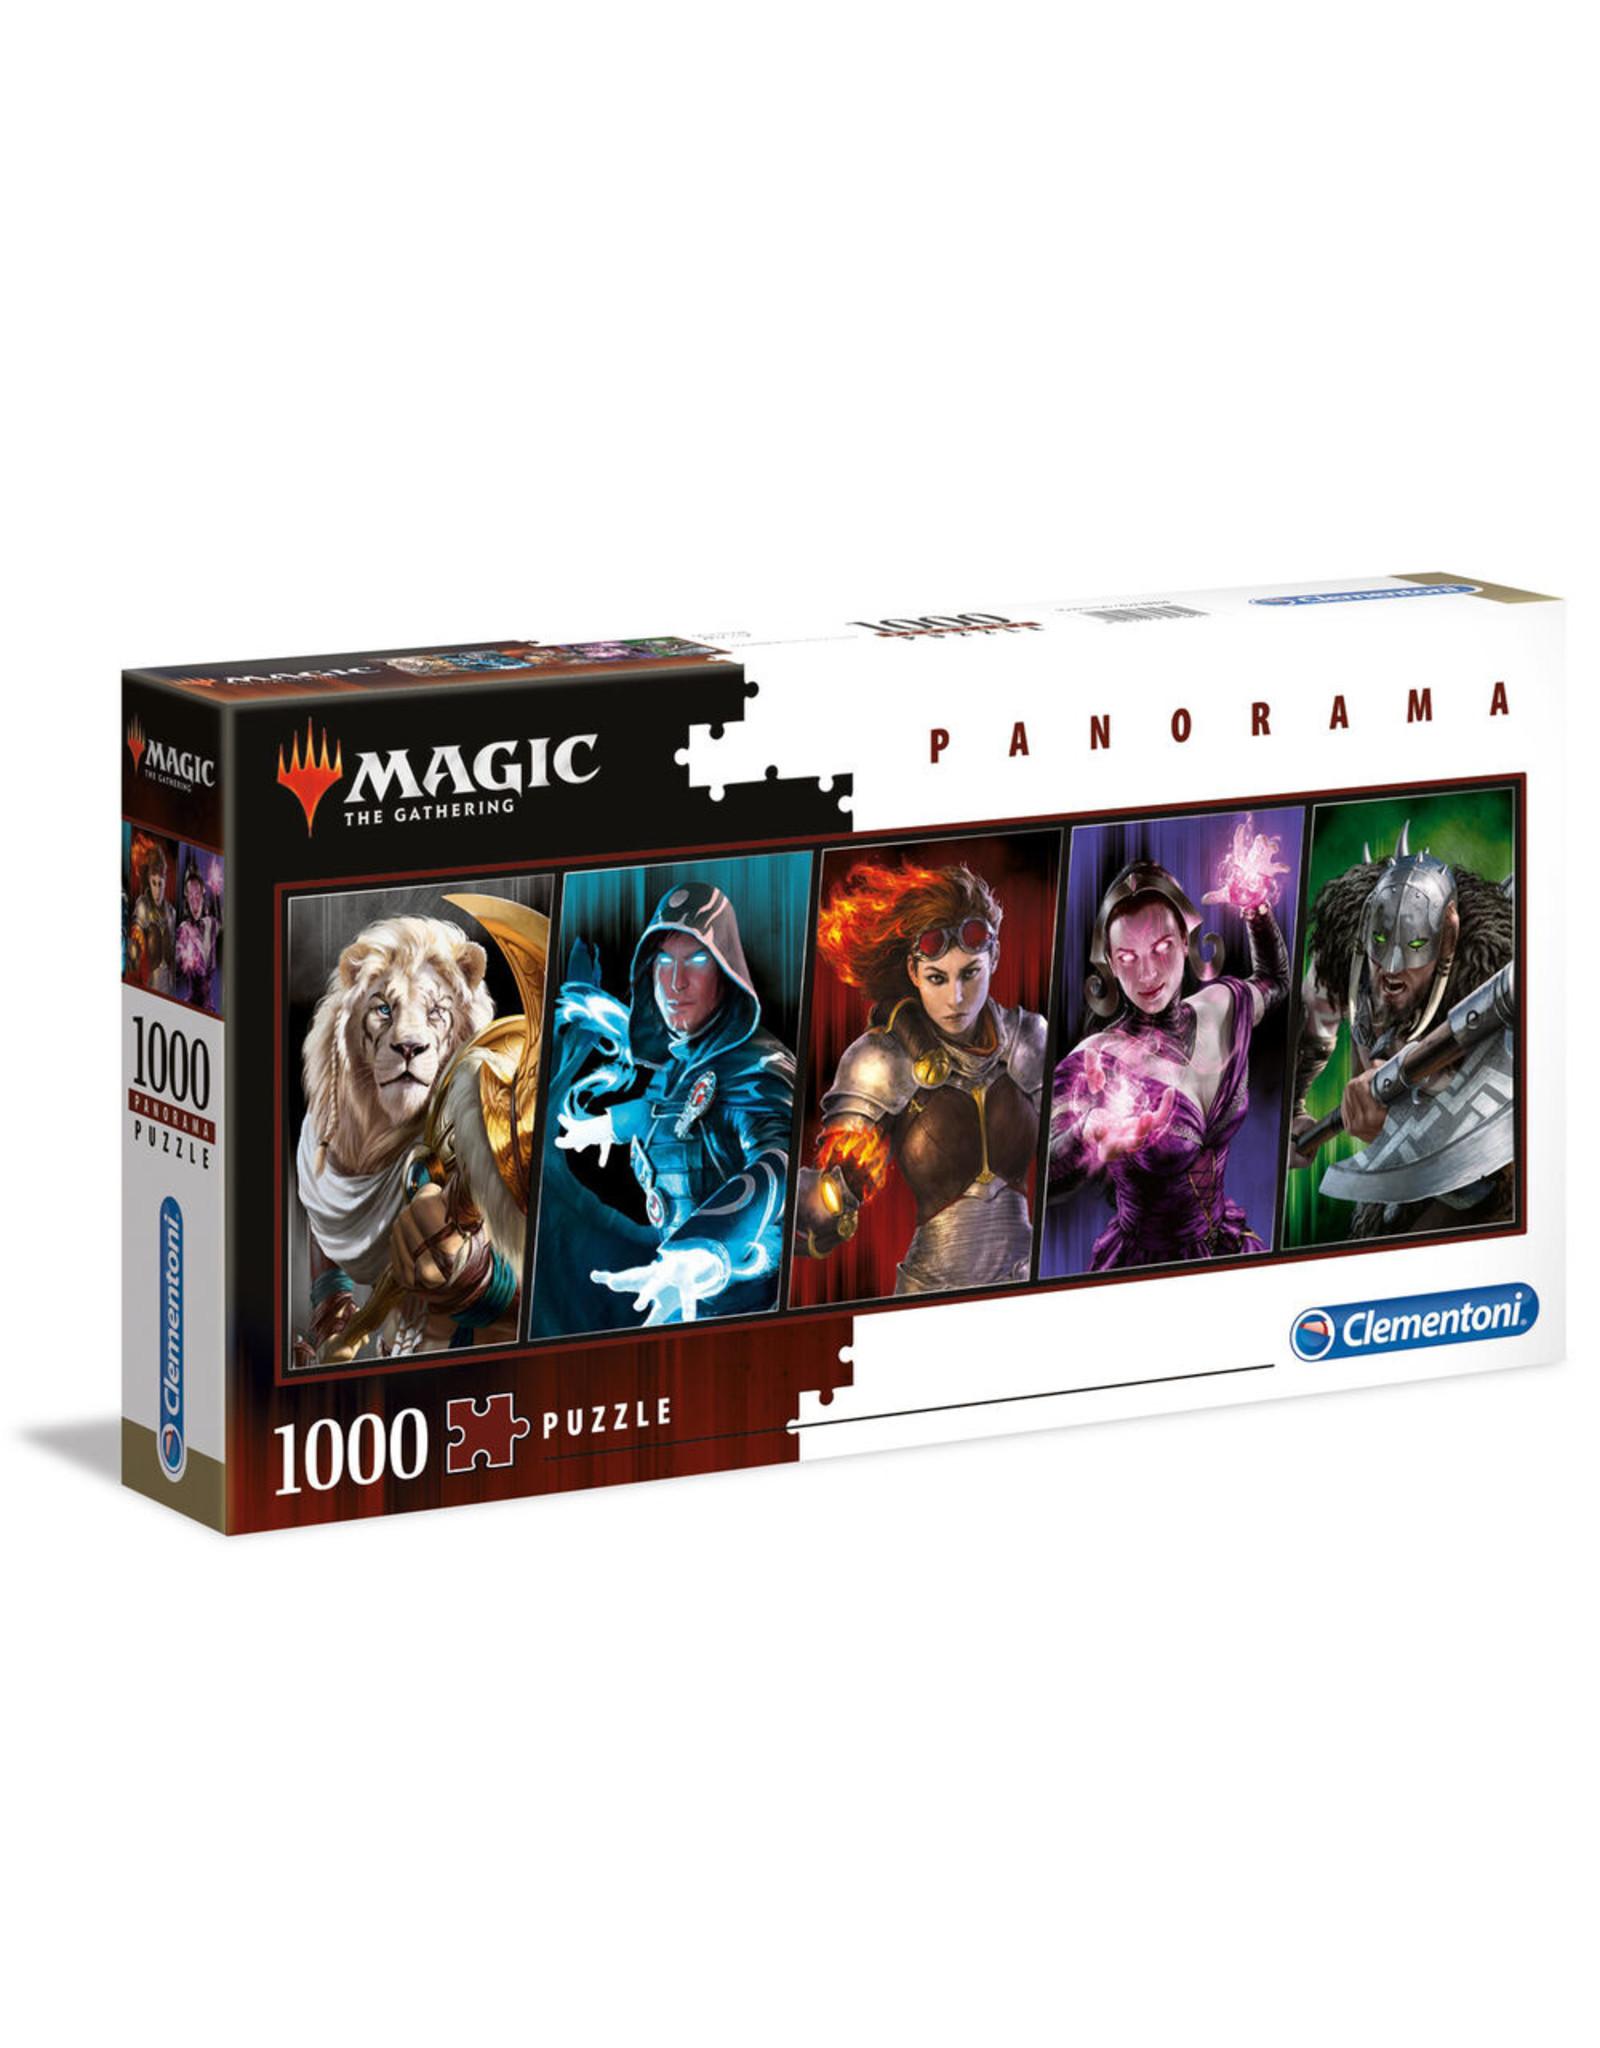 CLEMENTONI Magic The Gathering Panorama puzzel 1000 st.